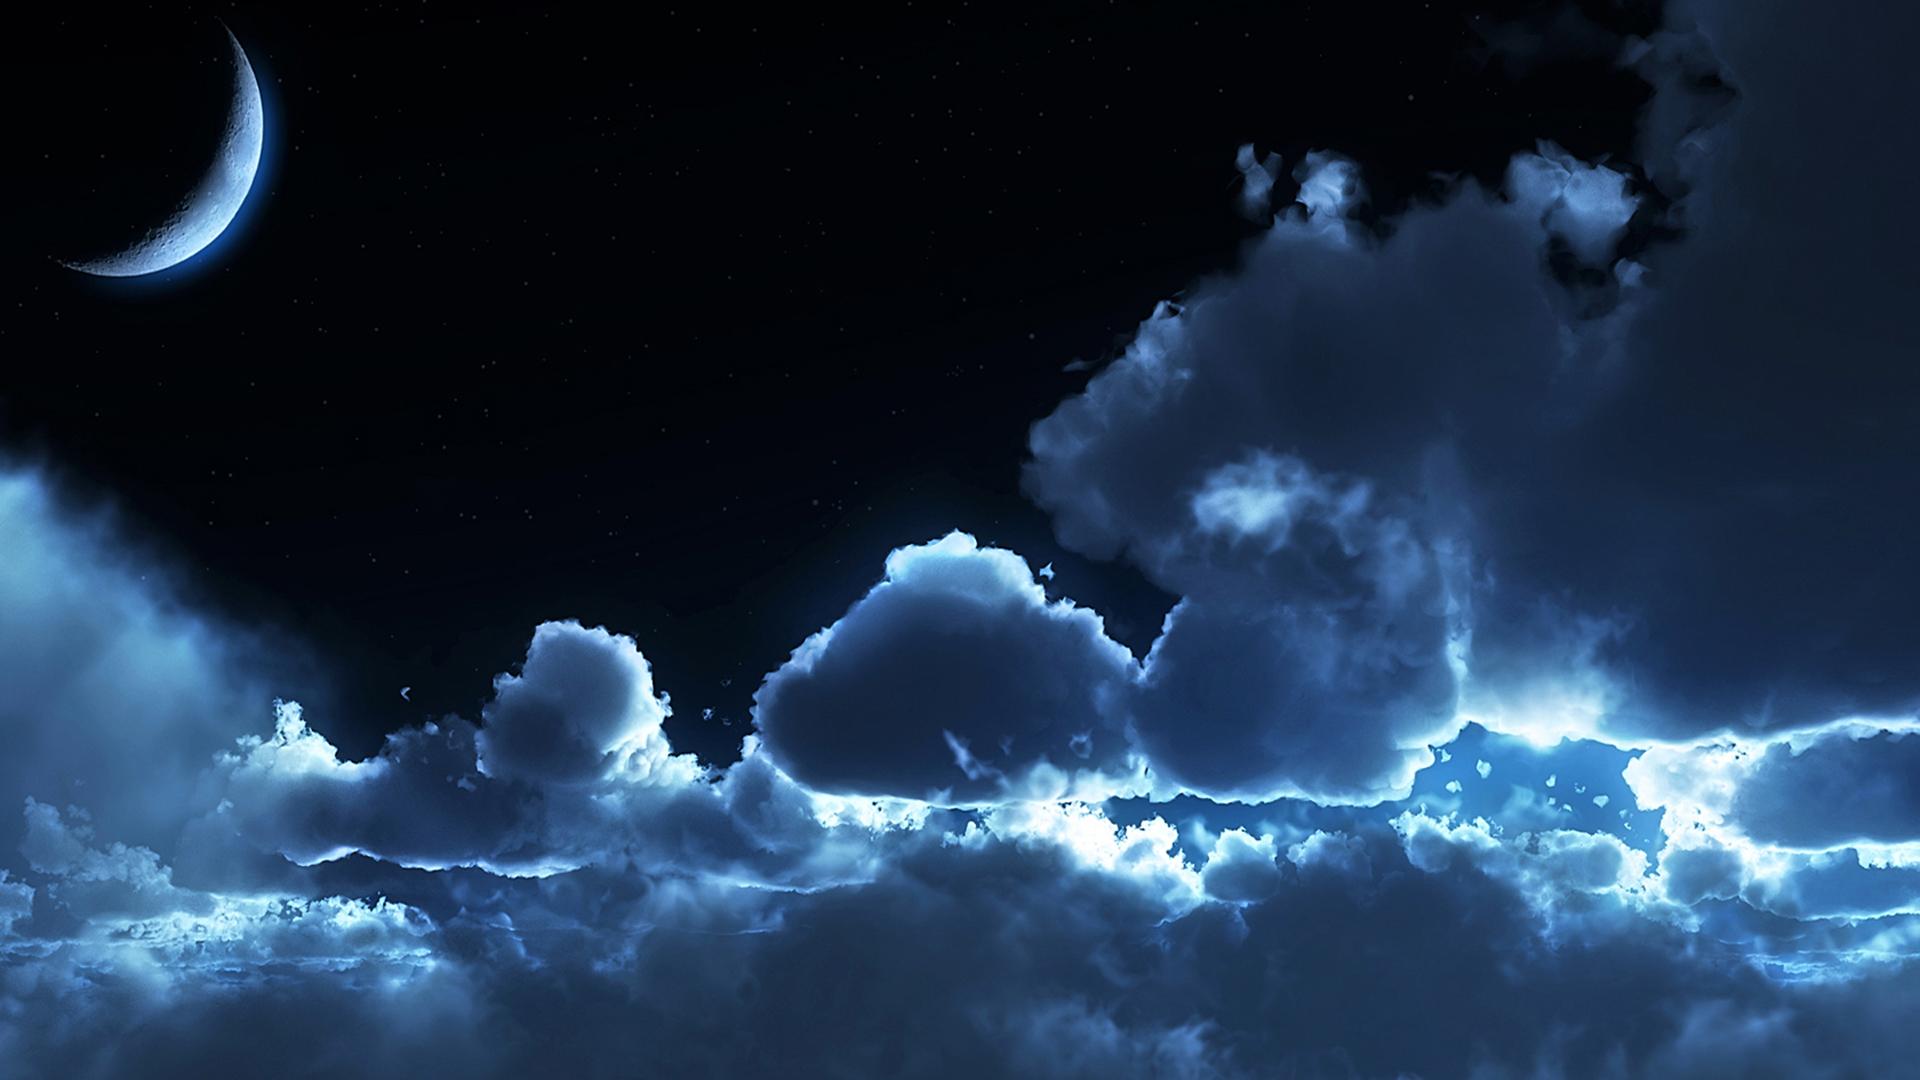 Sky HD Wallpaper